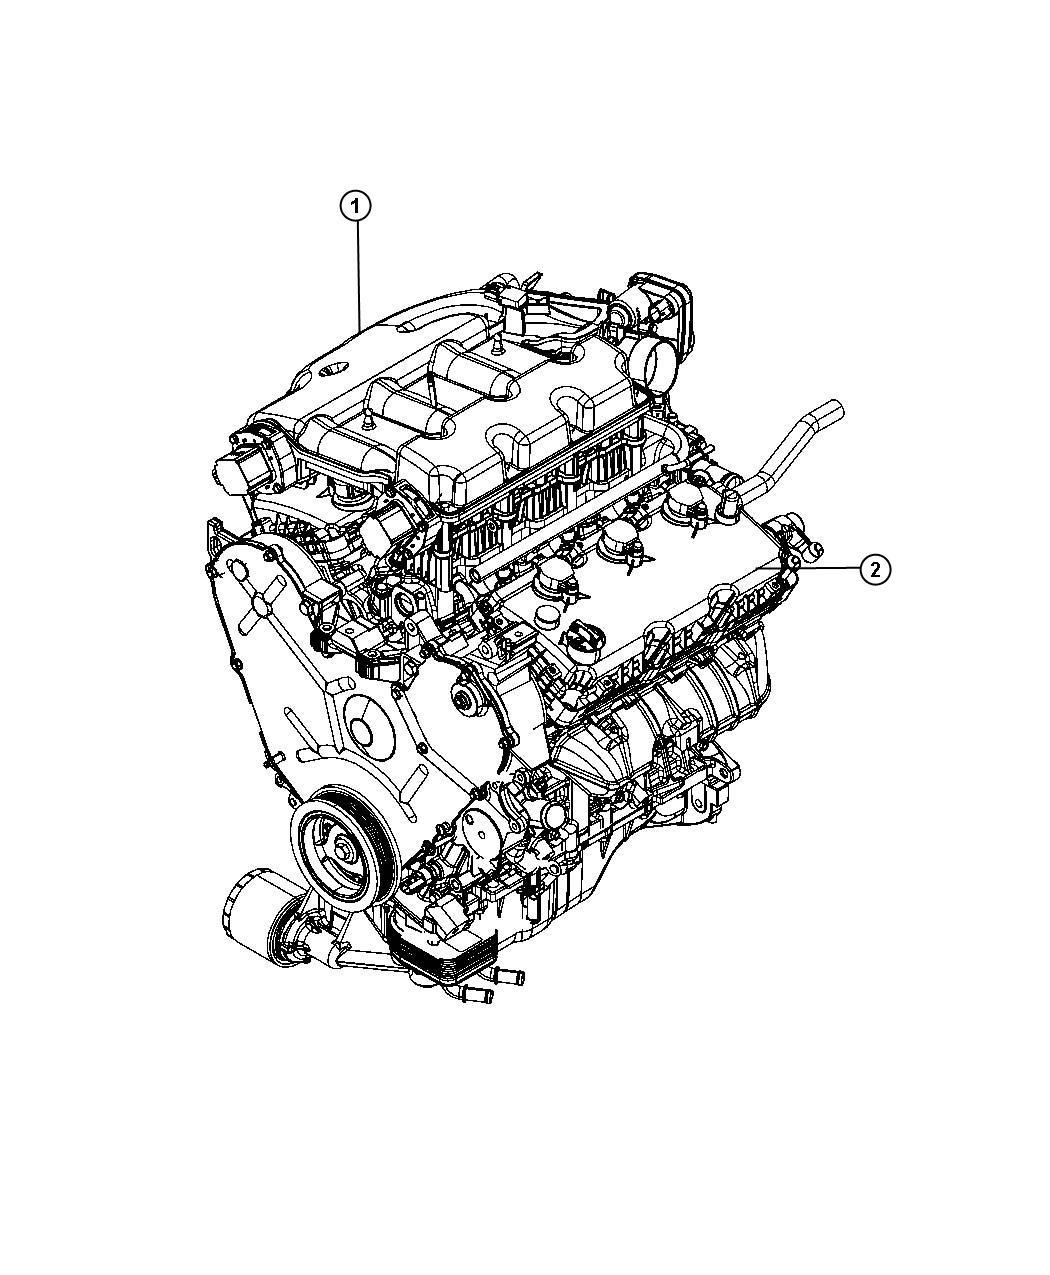 Sebring Engine Assembly And Service Long Block 3 5l 3 5l